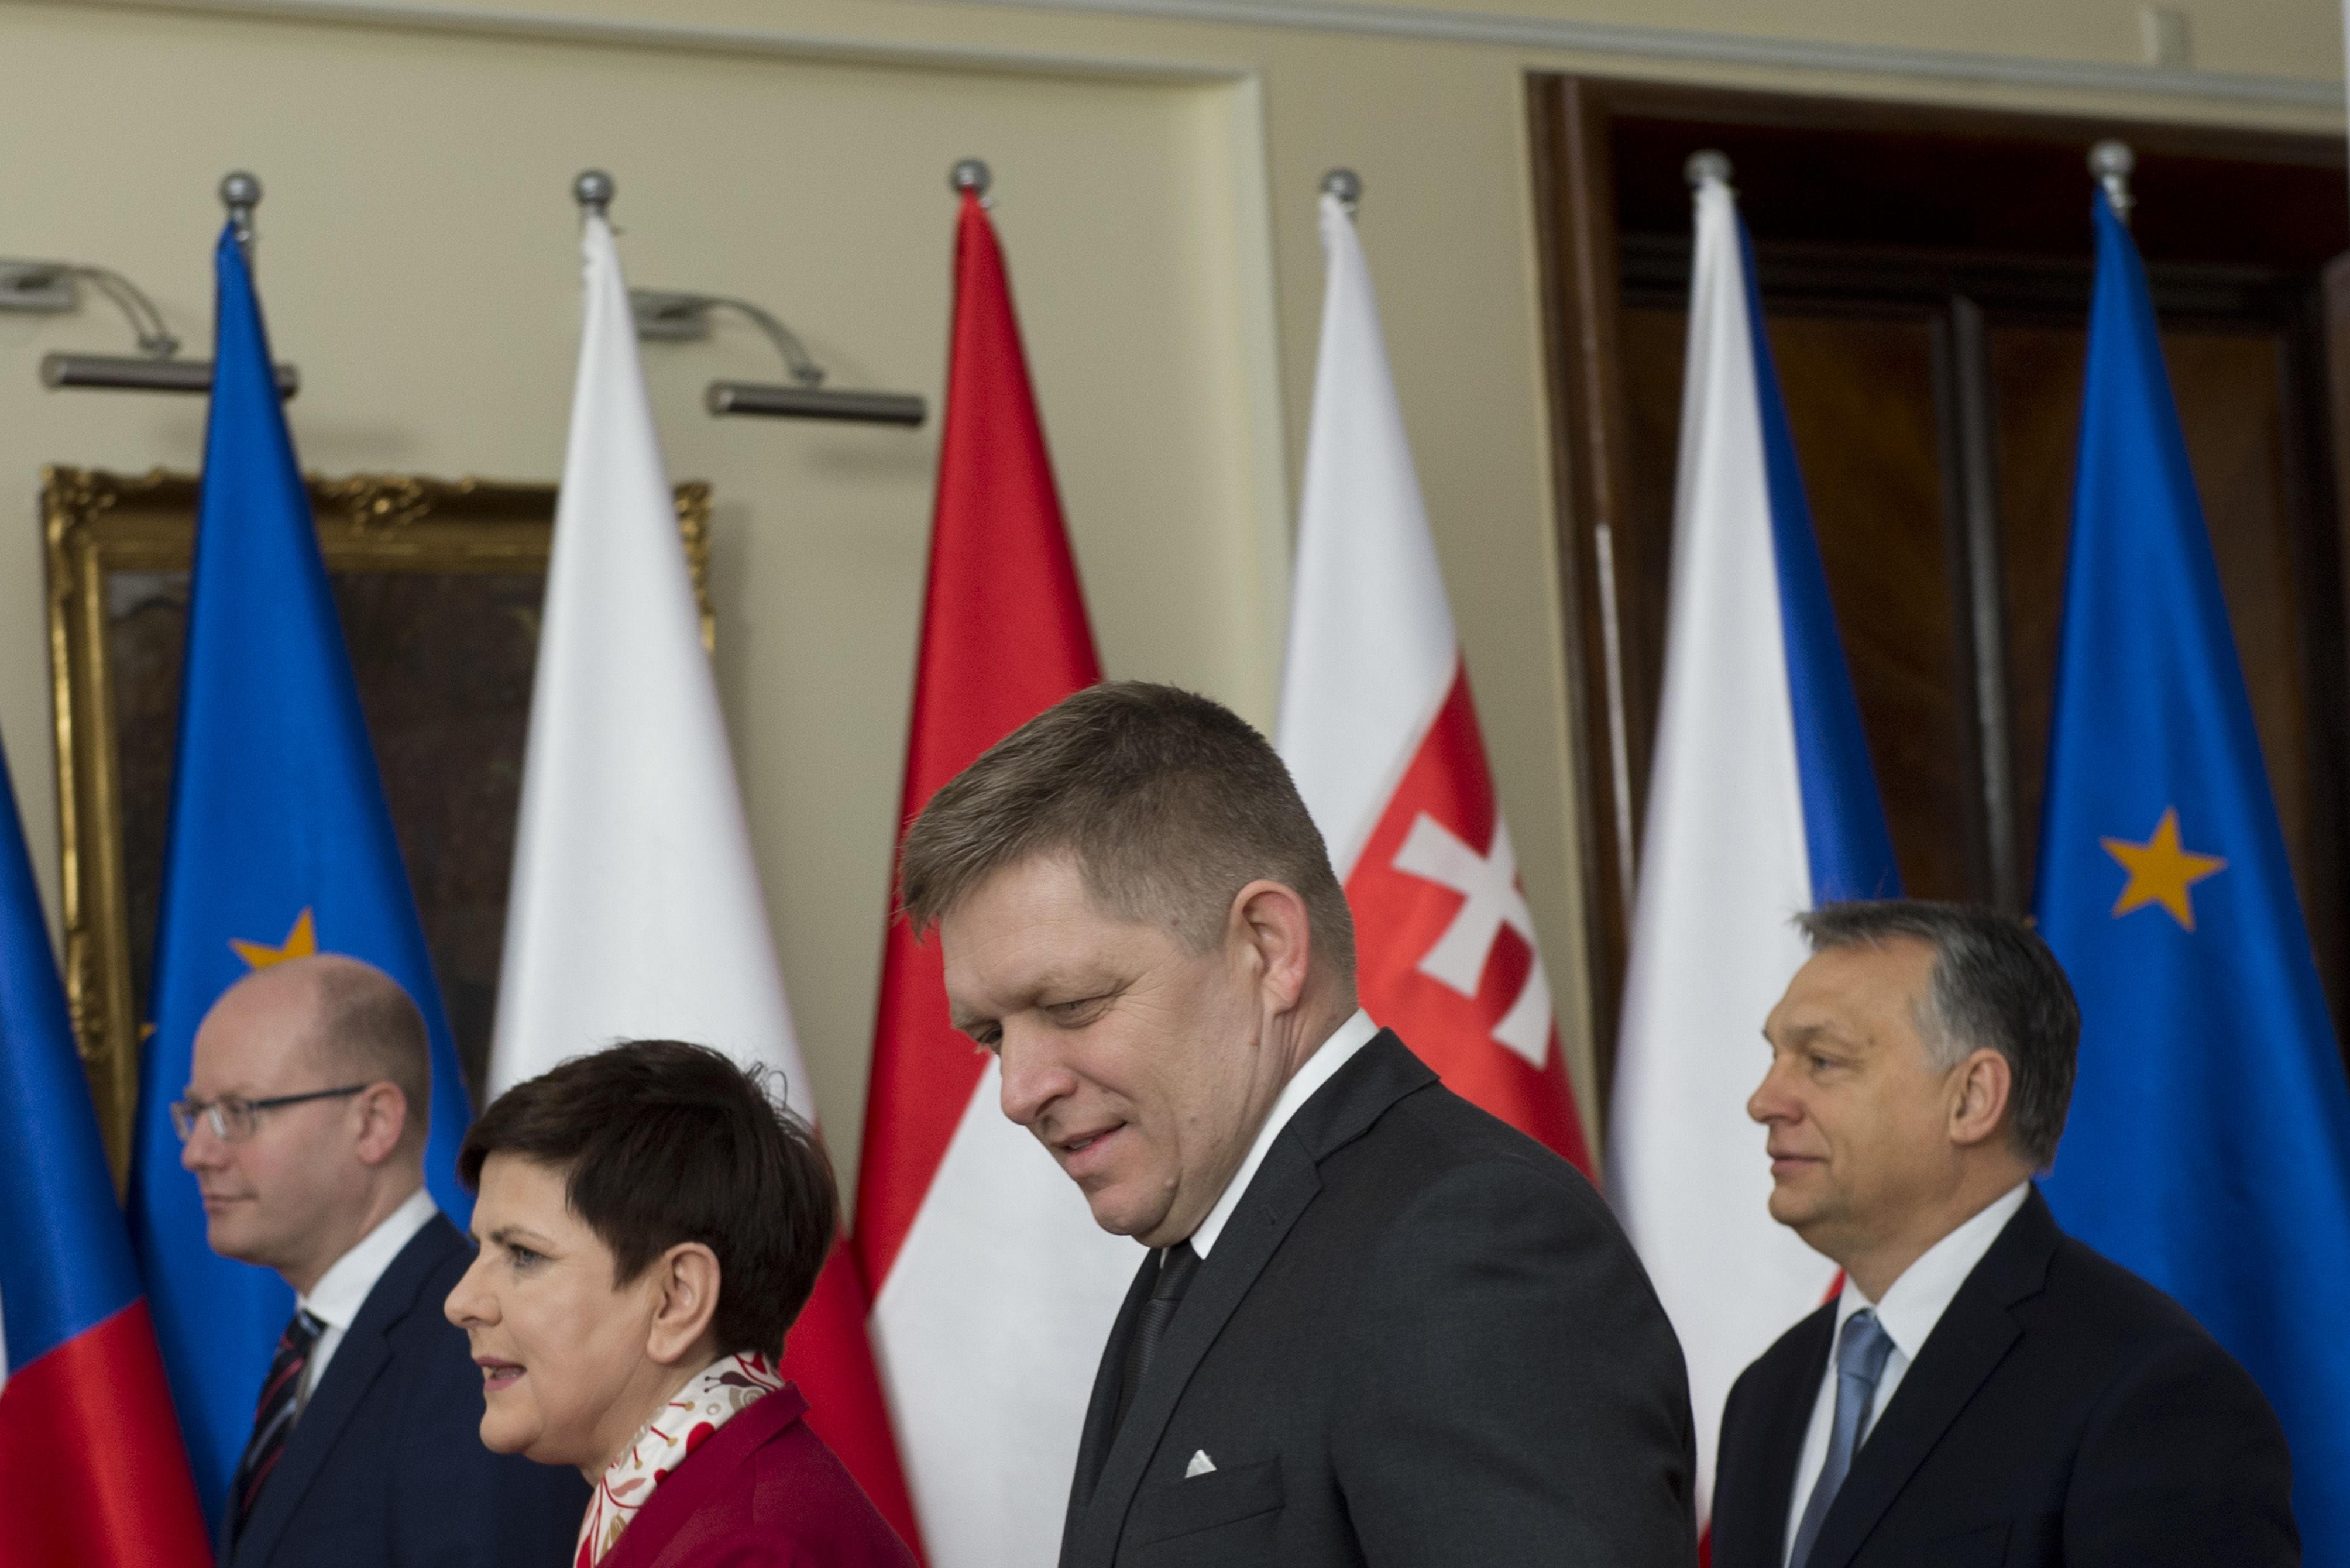 V4, Vyšehradská skupina, Rusko, Ukrajina